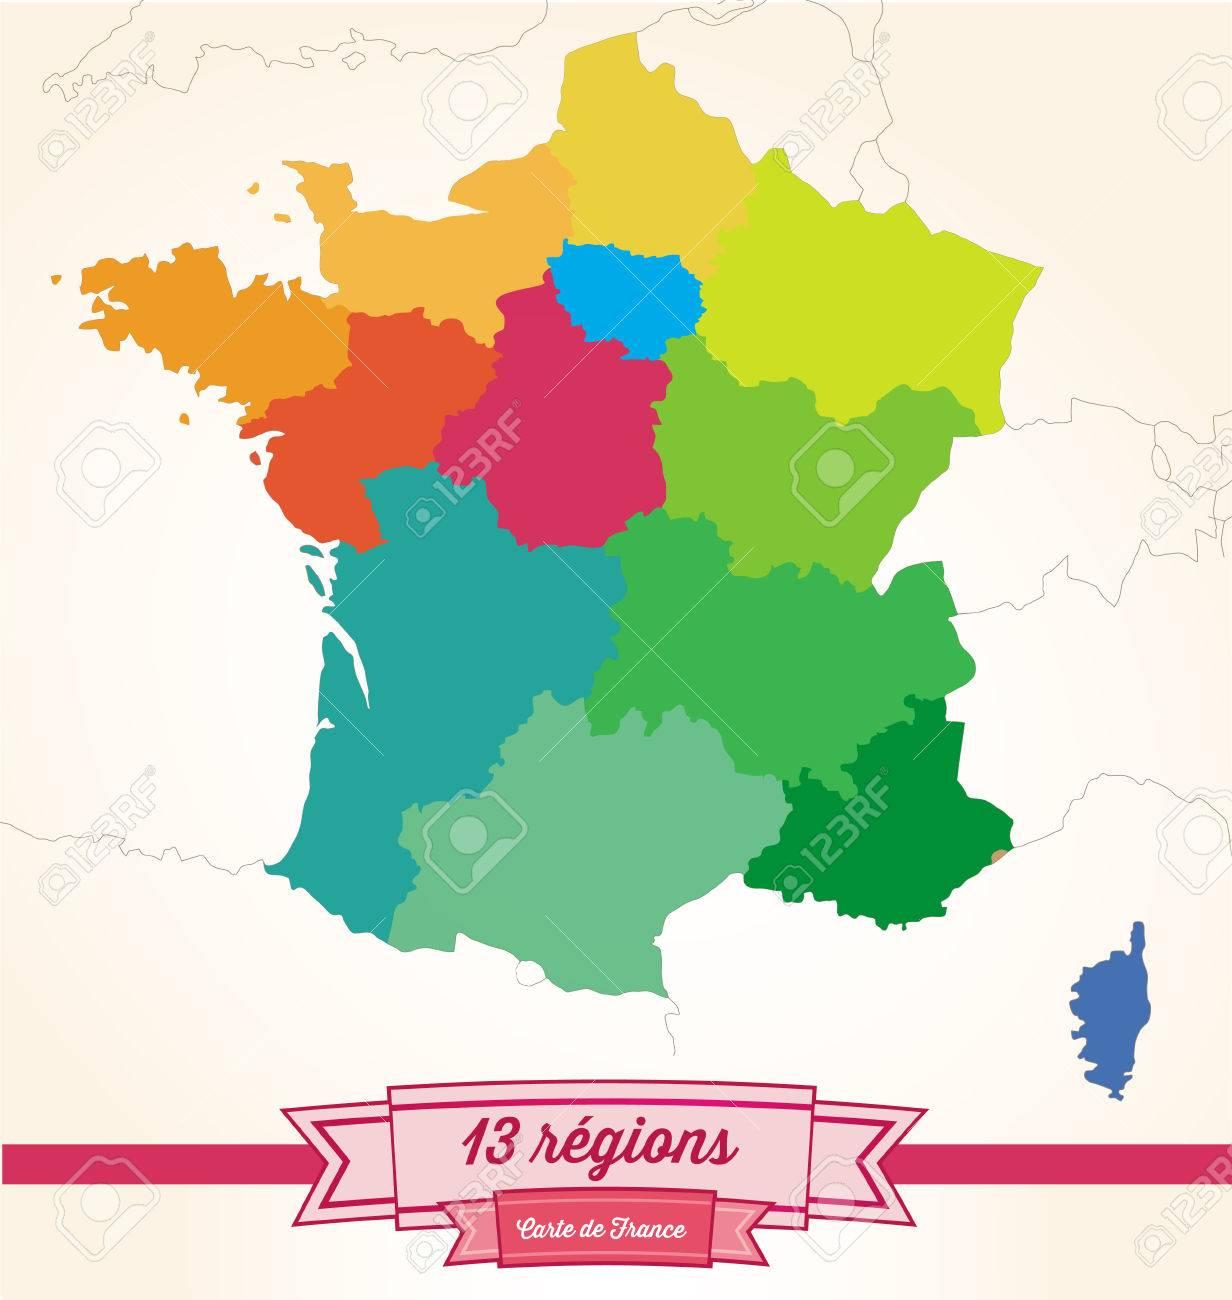 Regions From France à Les 13 Régions